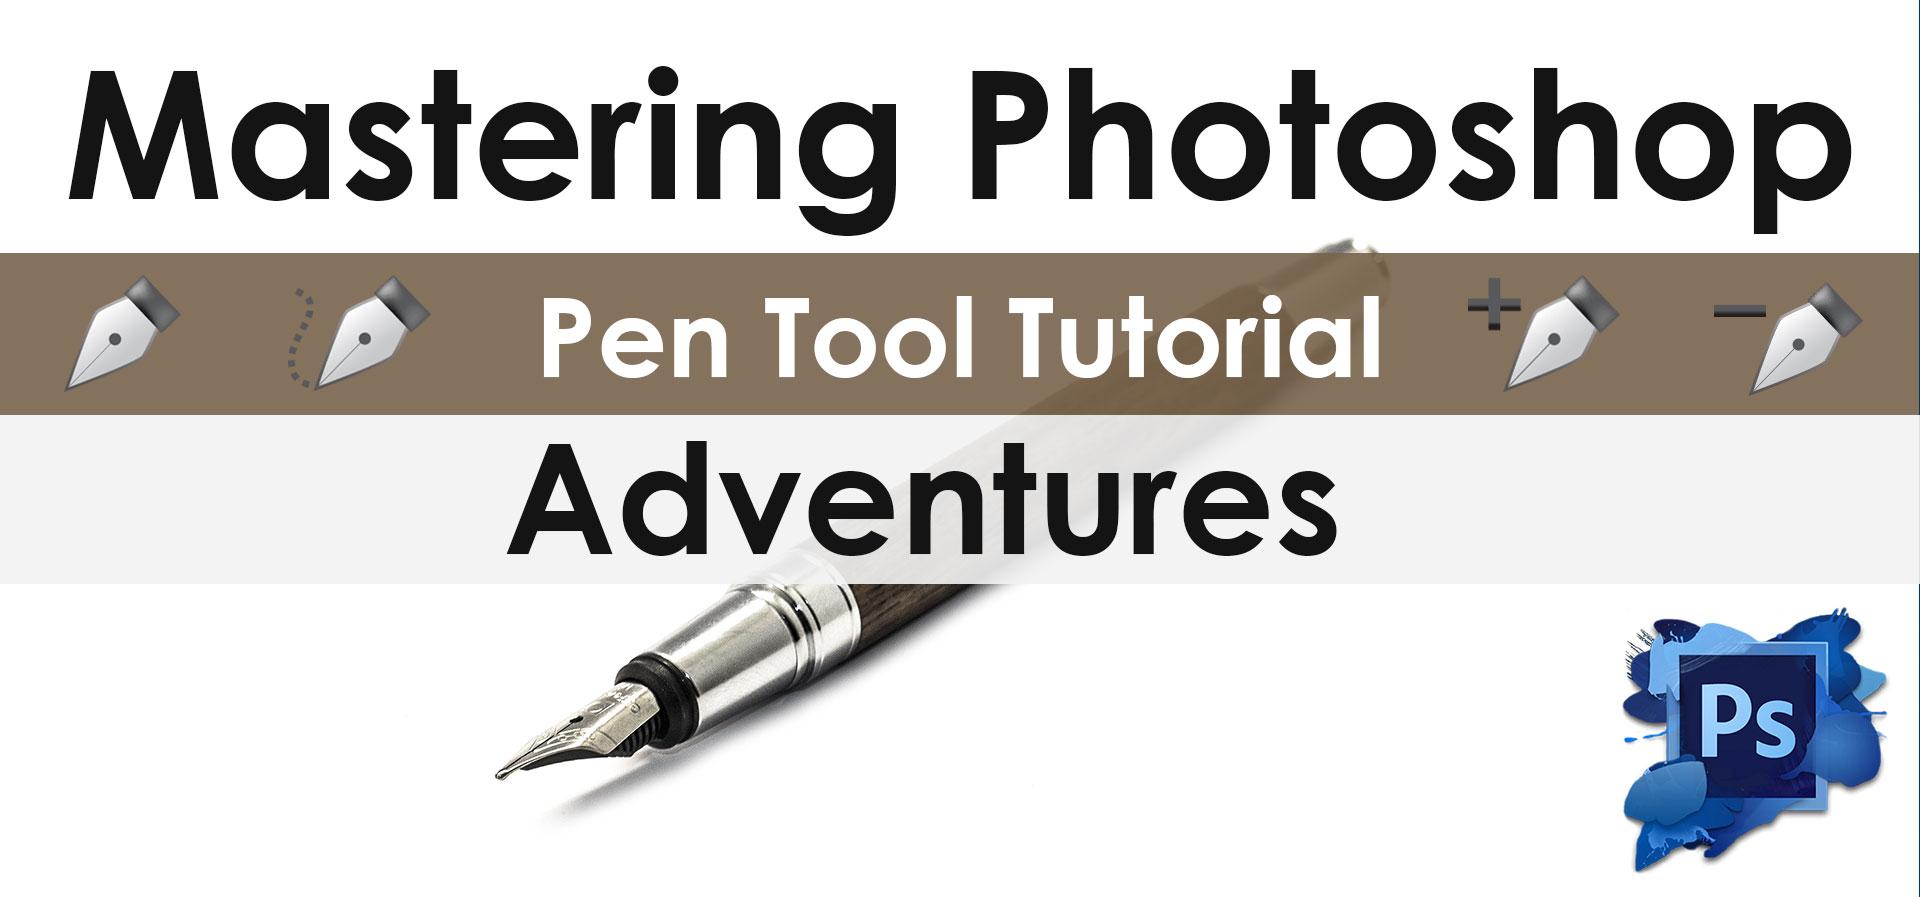 Mastering-Photoshop-Pen-Tool-Tutorial-Adventures